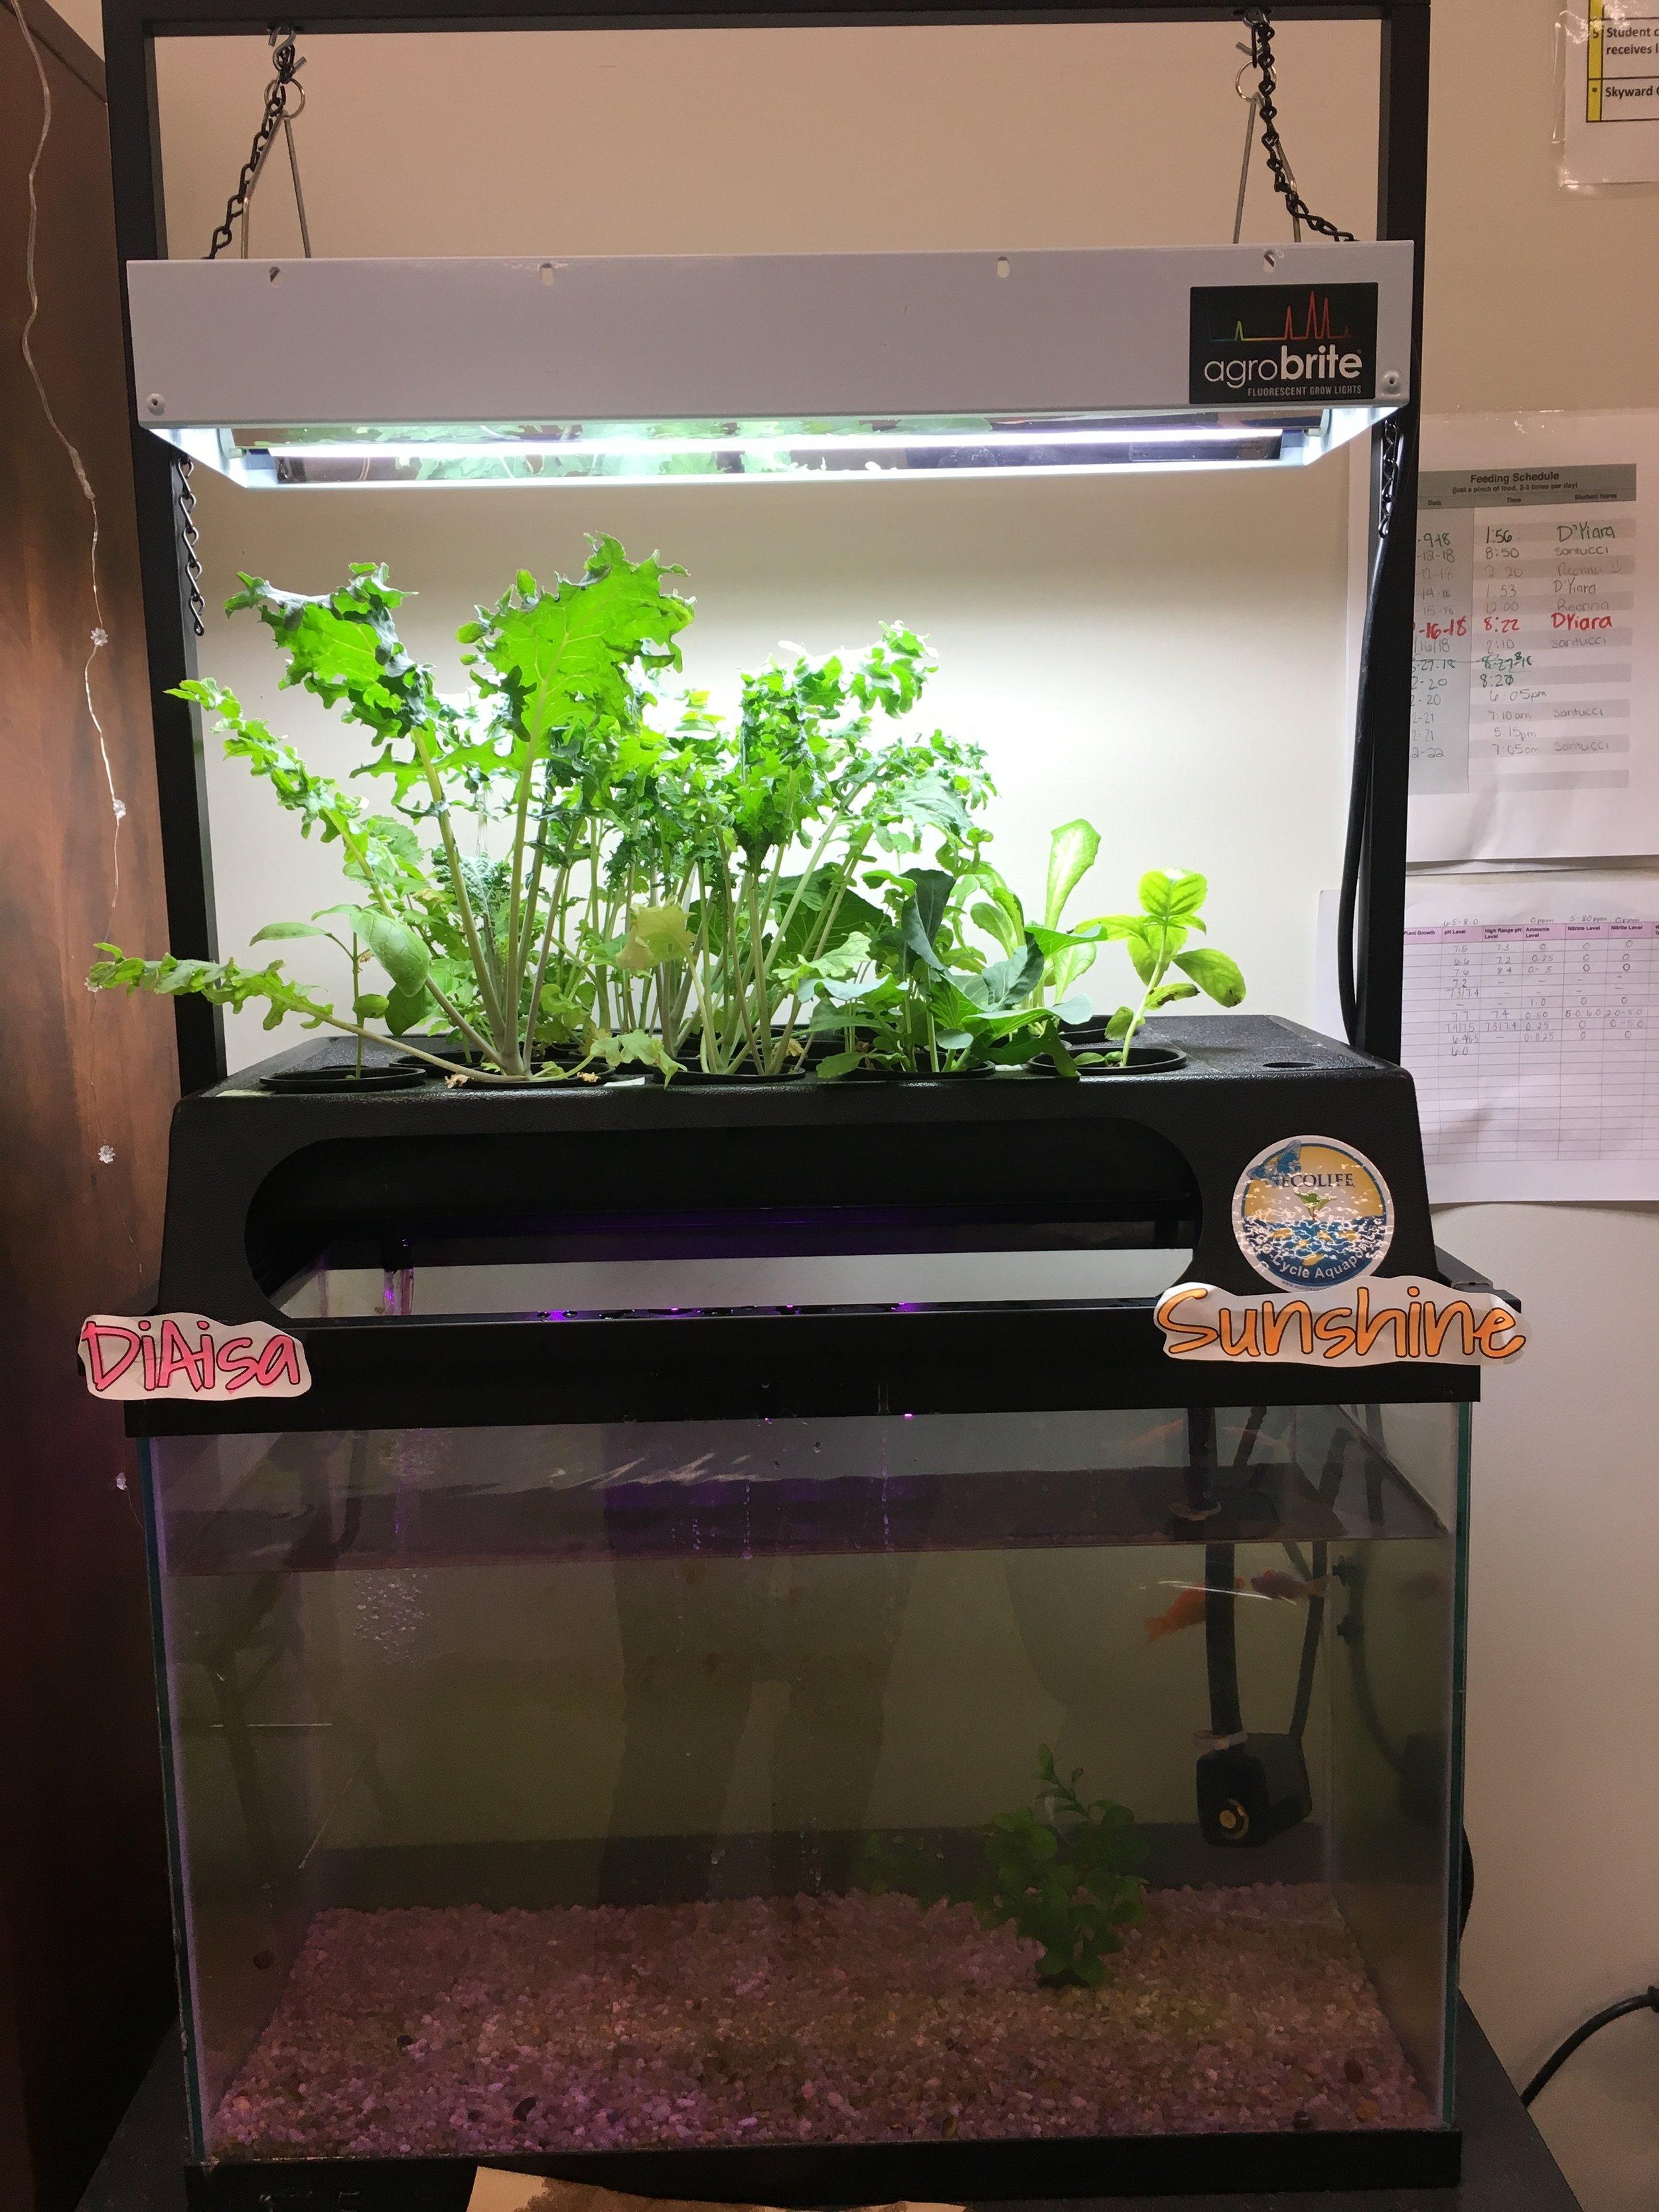 Aquaponics Tank in the Classroom